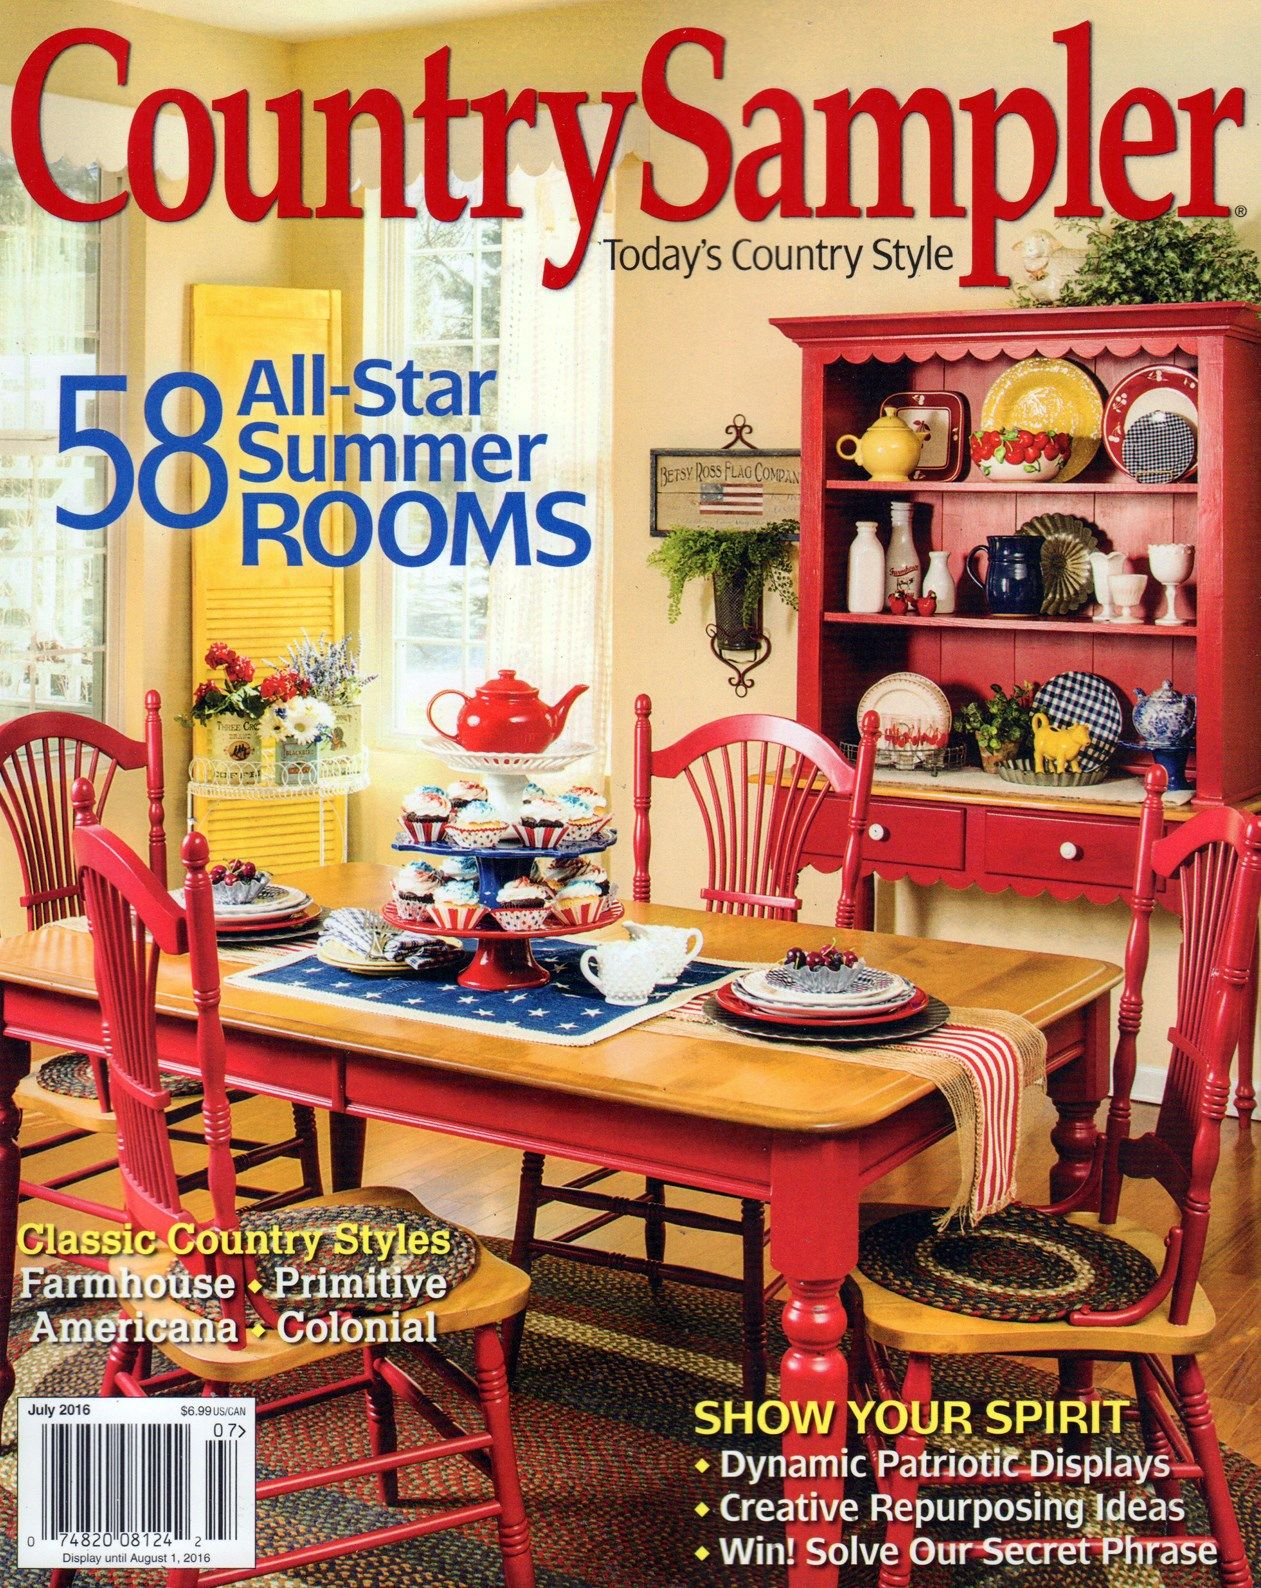 Country Sampler Cover for 7/1/2016 Country sampler